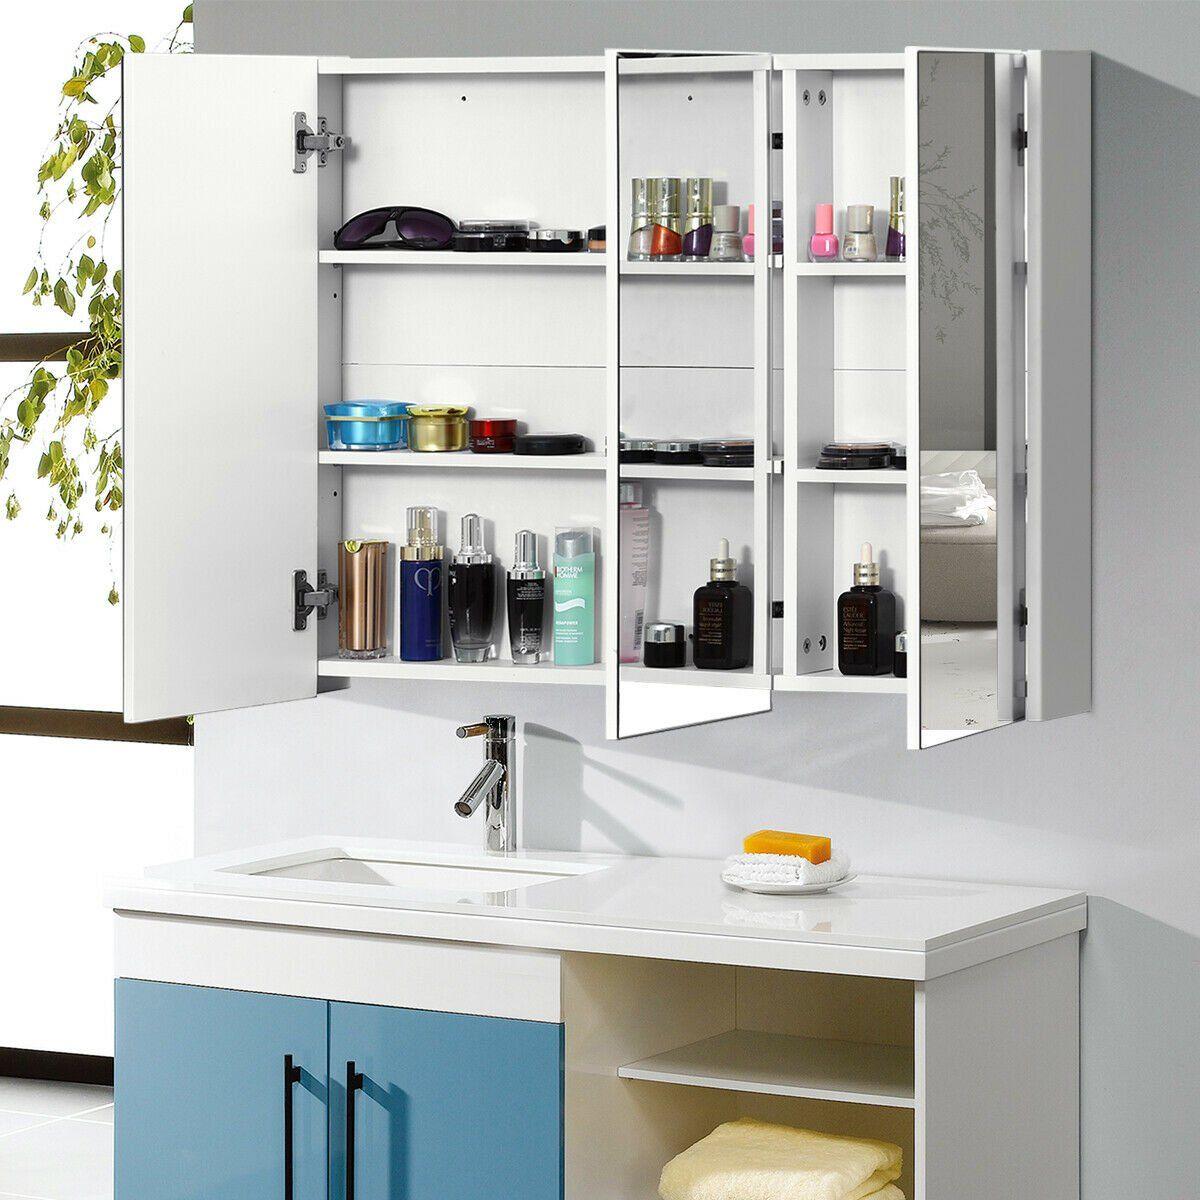 36 Wide Wall Mount Mirrored Bathroom Medicine Cabinet Triple Mirror Door Walmart Com In 2021 Bathroom Medicine Cabinet Medicine Cabinet Storage Adjustable Shelving